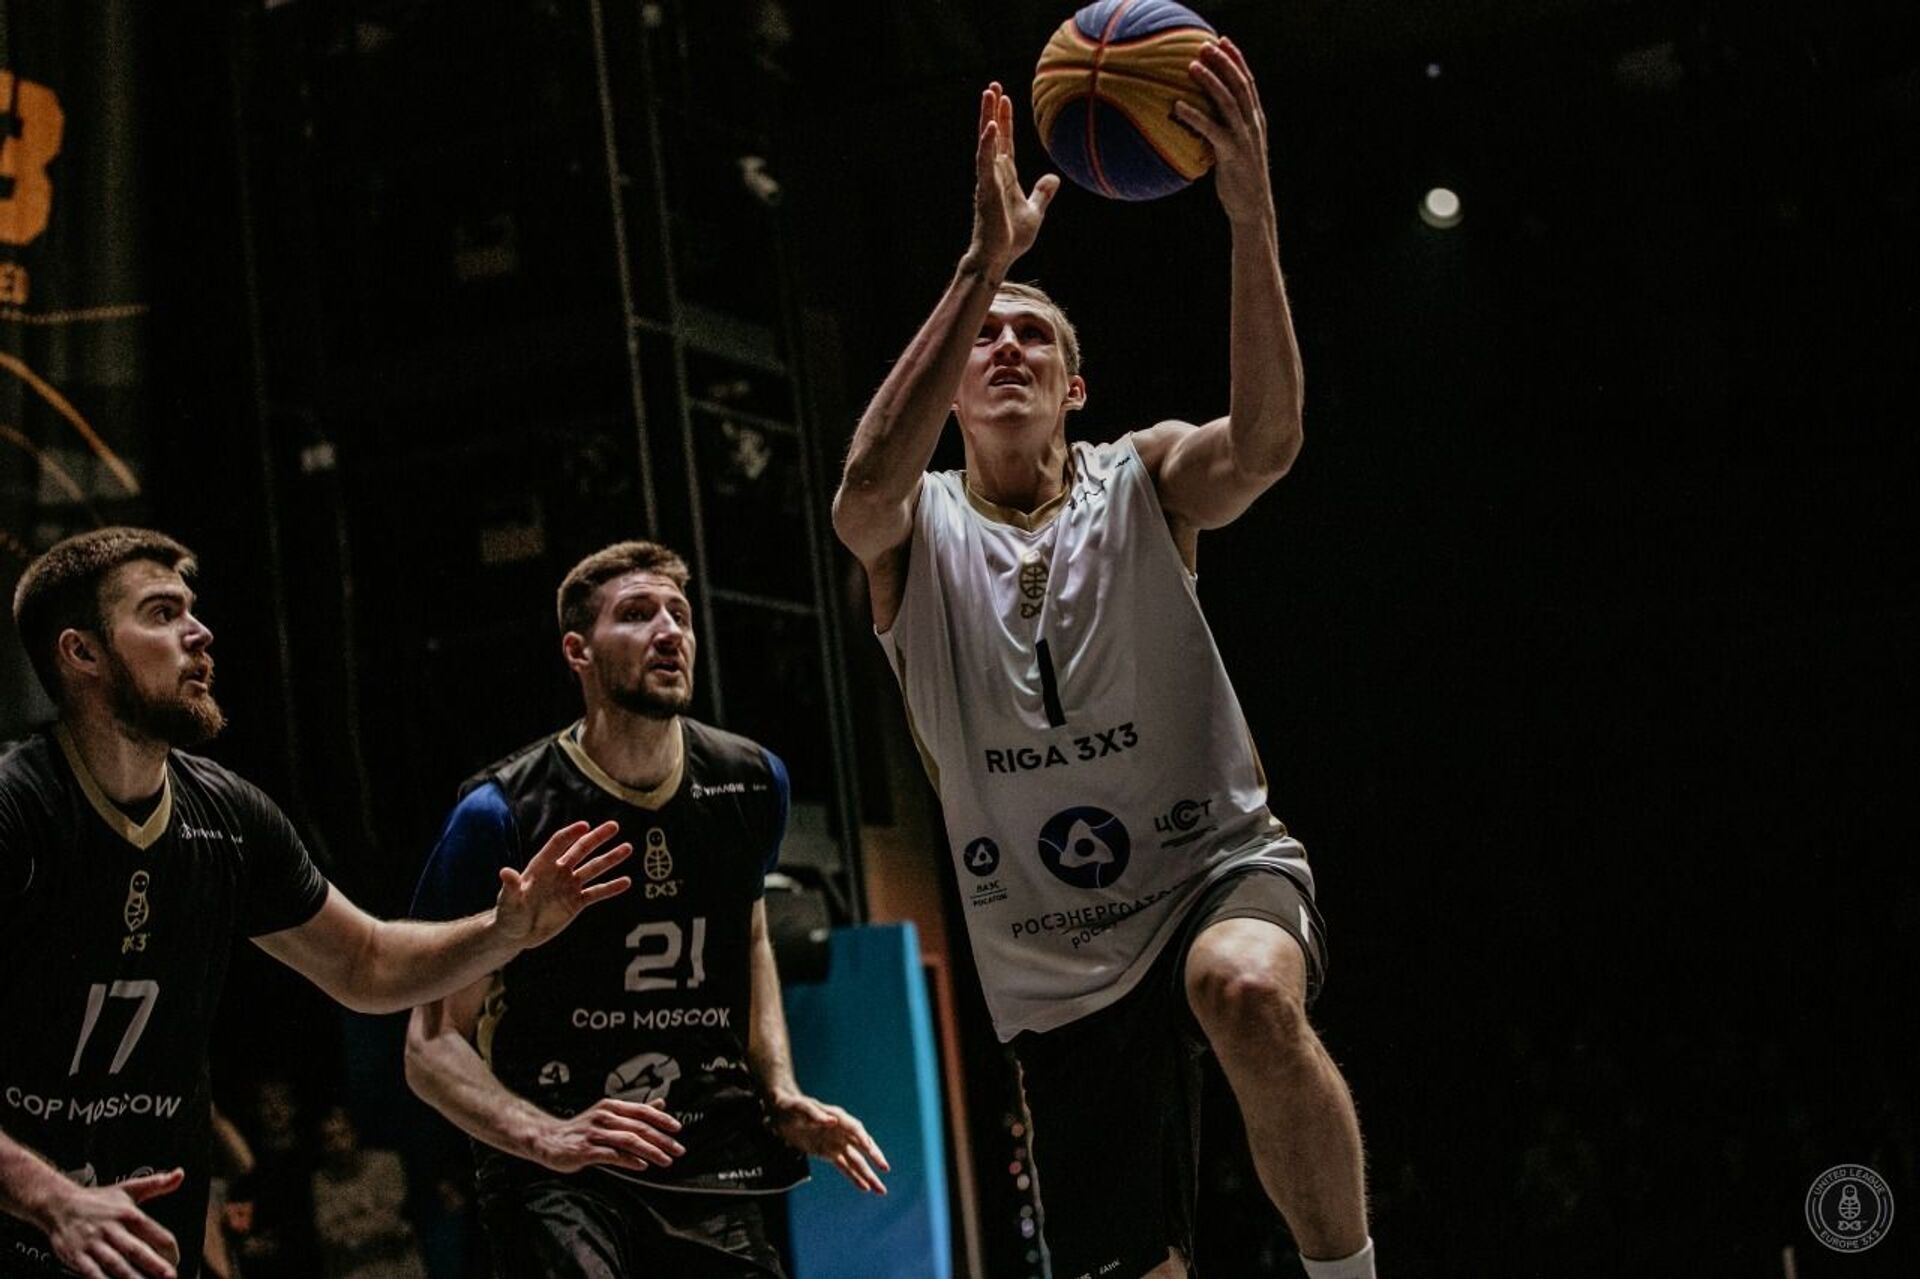 Команда Рига по баскетболу 3×3 - Sputnik Латвия, 1920, 01.06.2021